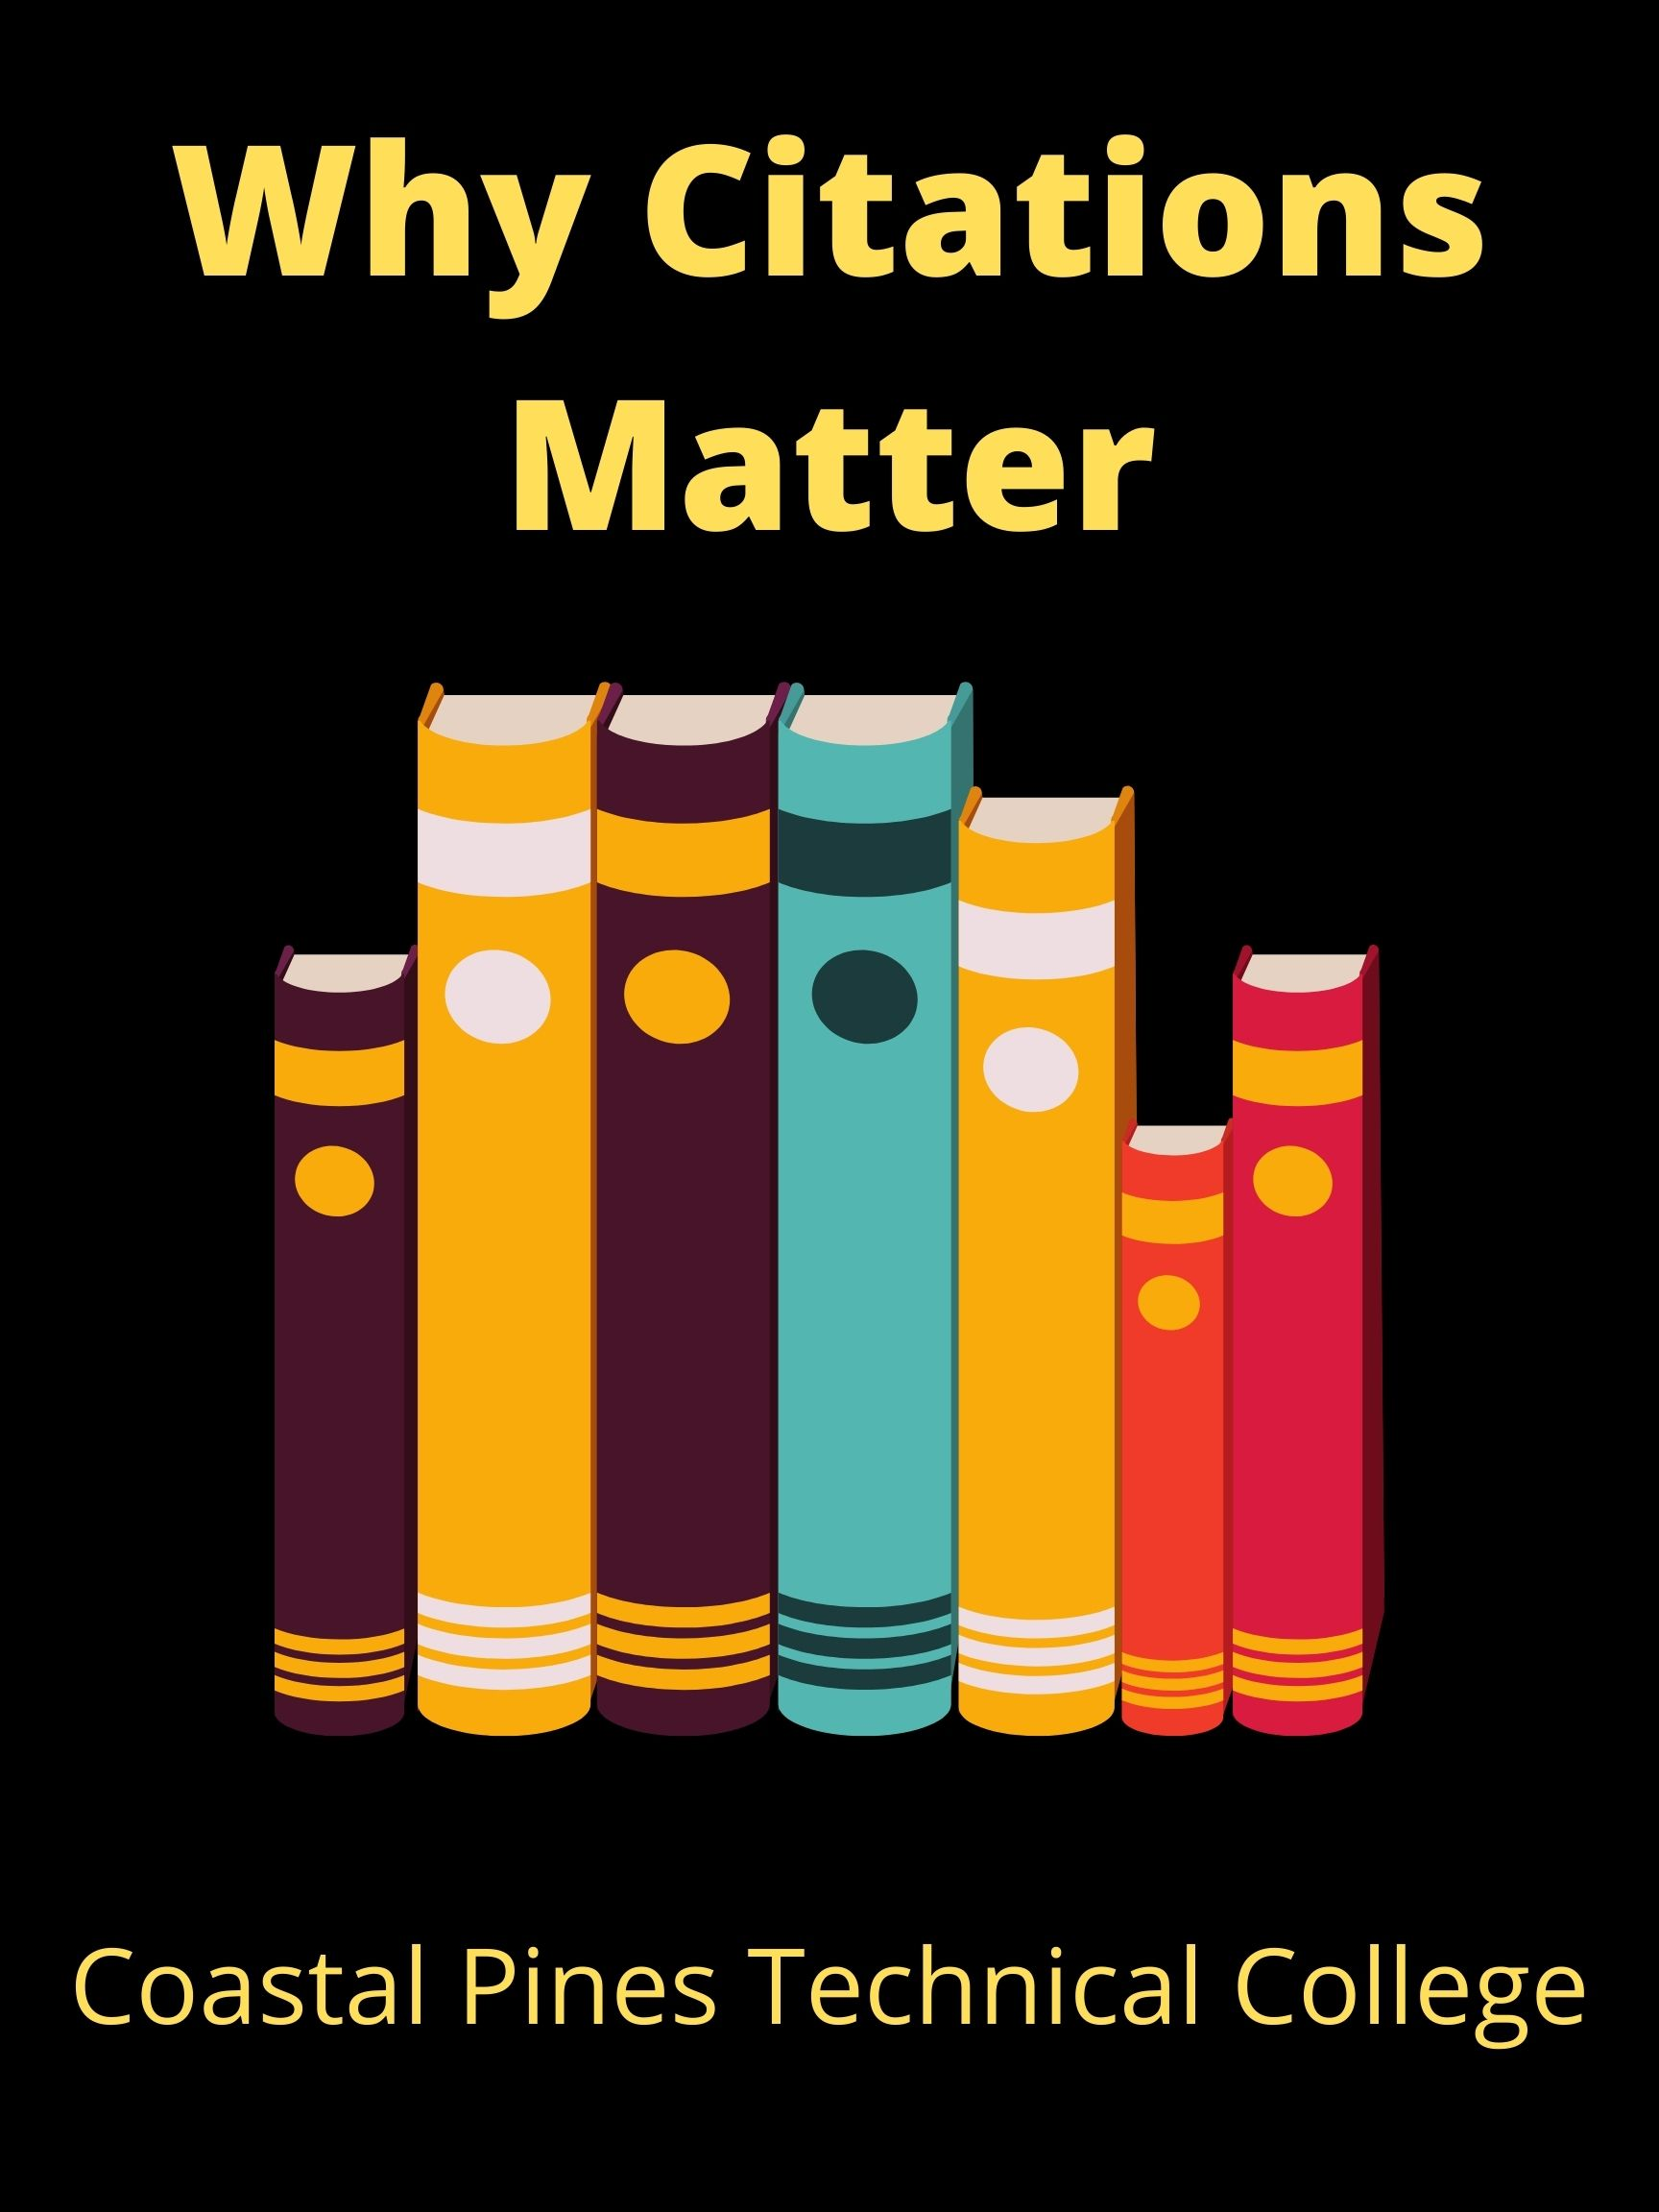 Why Citations Matter